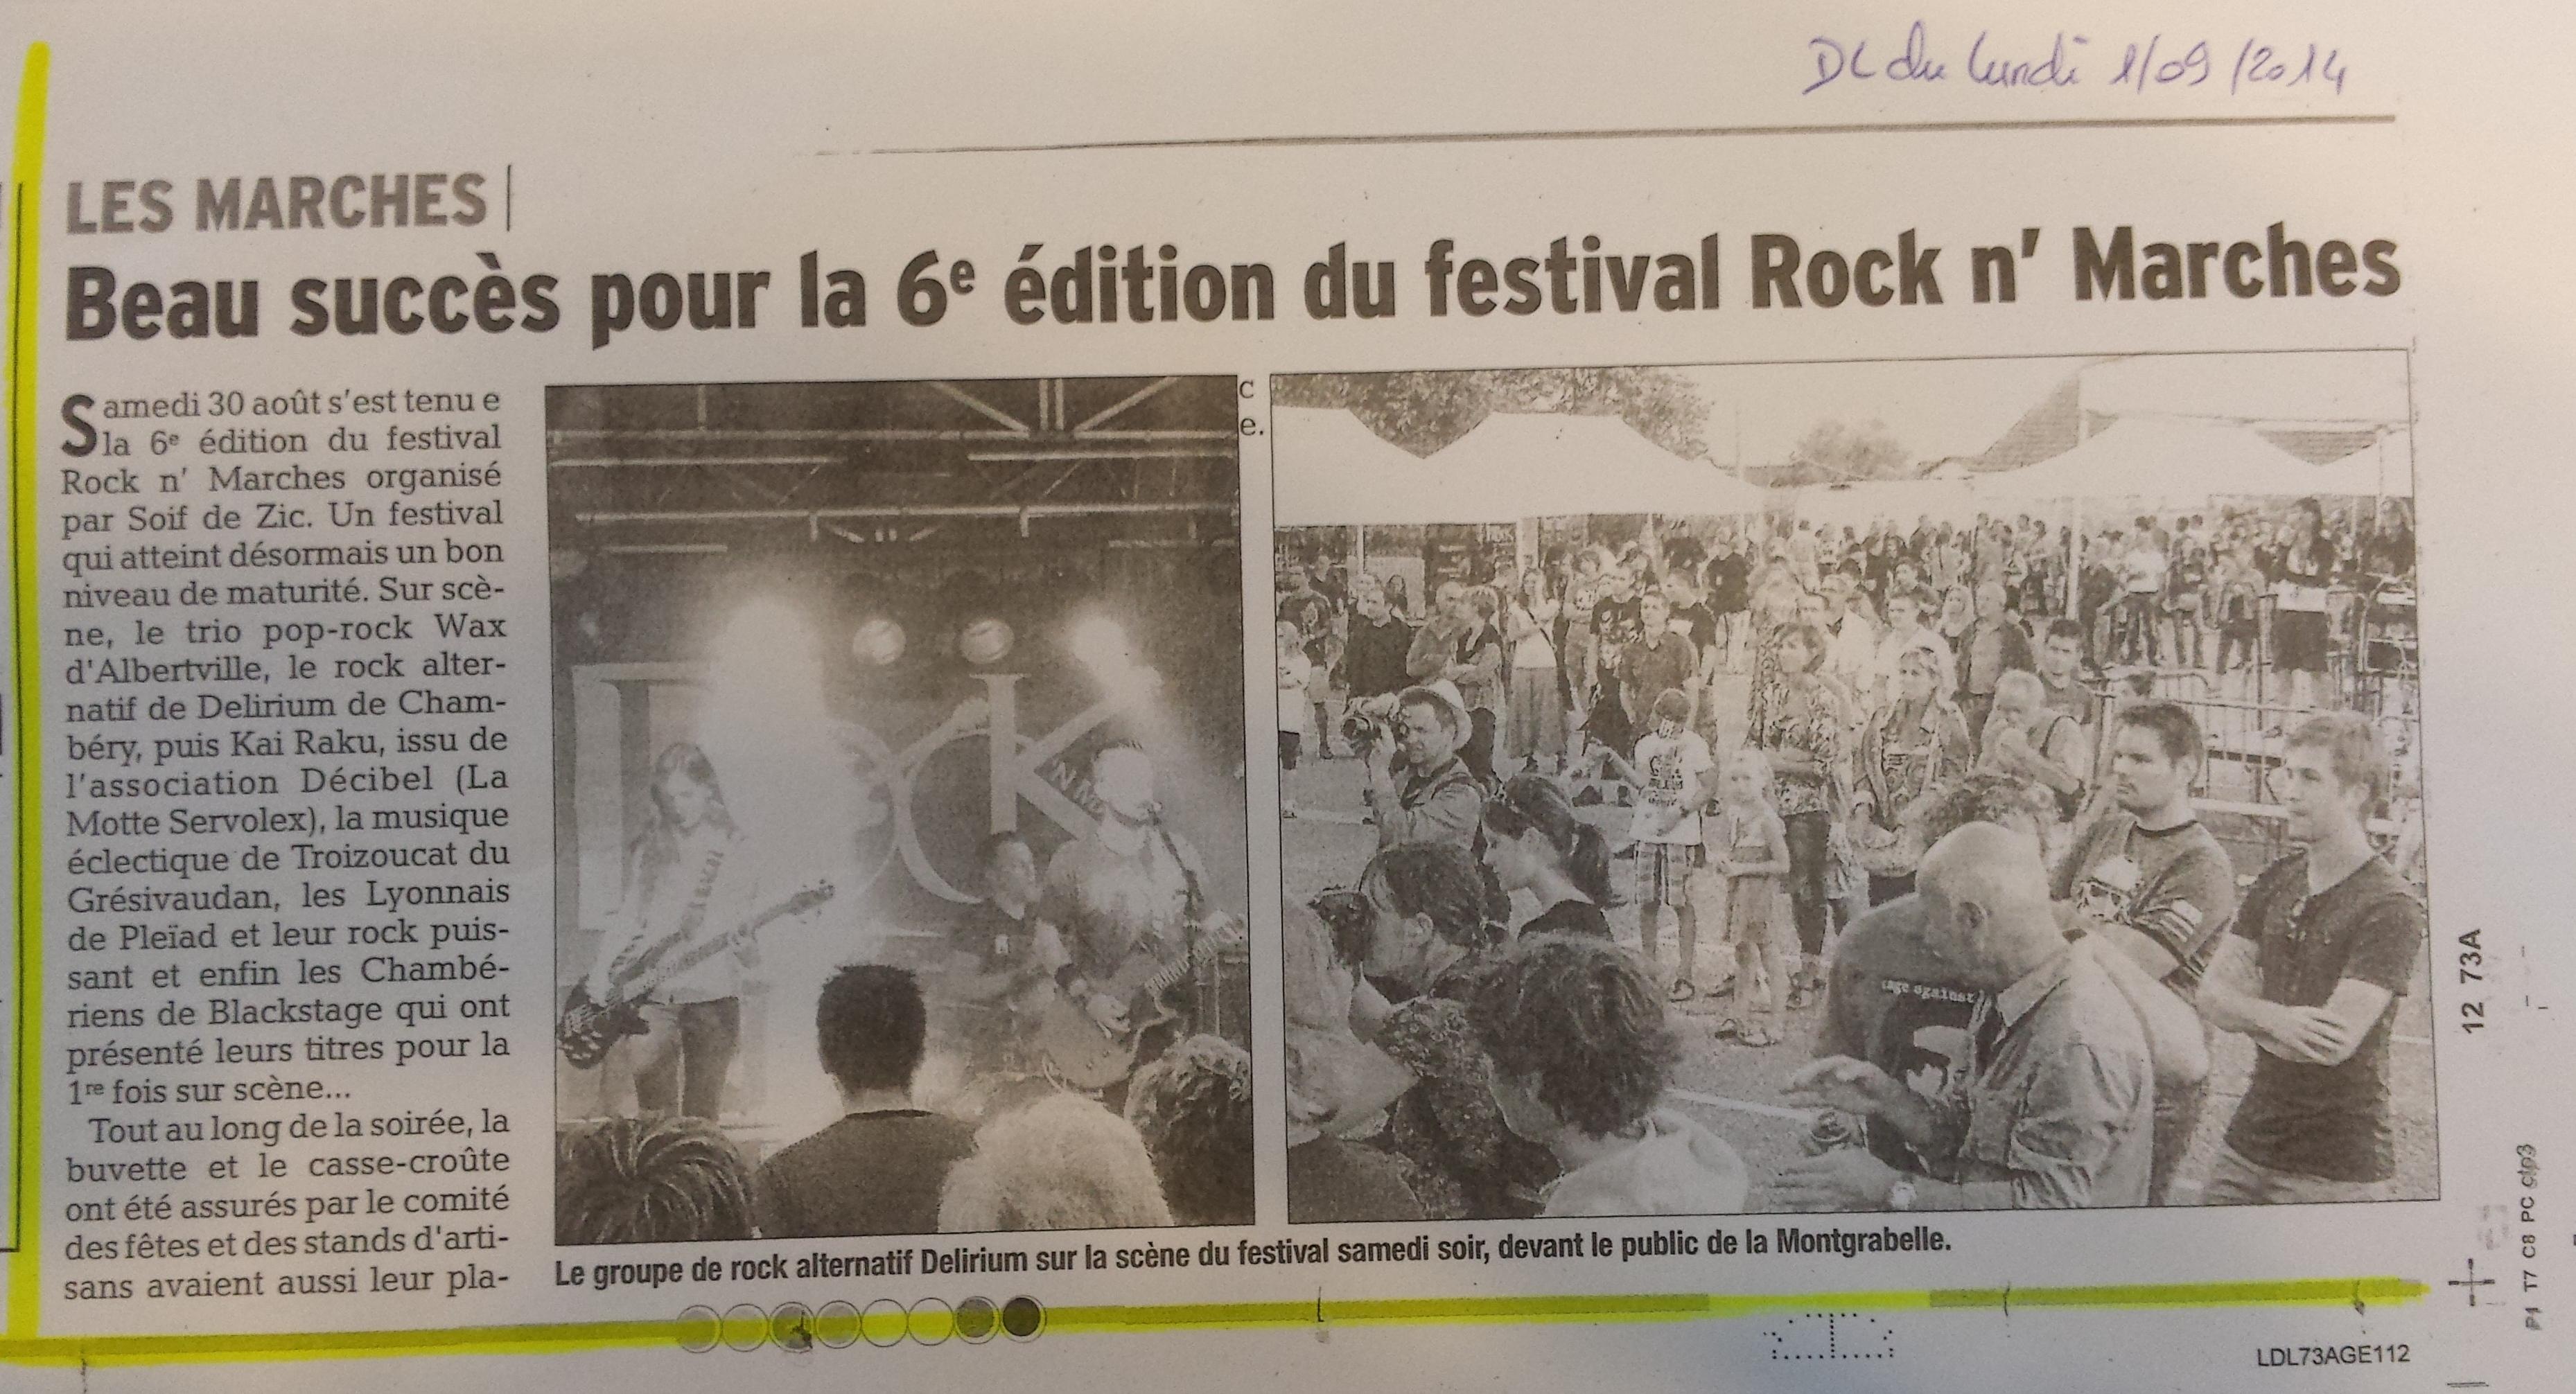 Article DL_2014-09-01_Photo.jpg